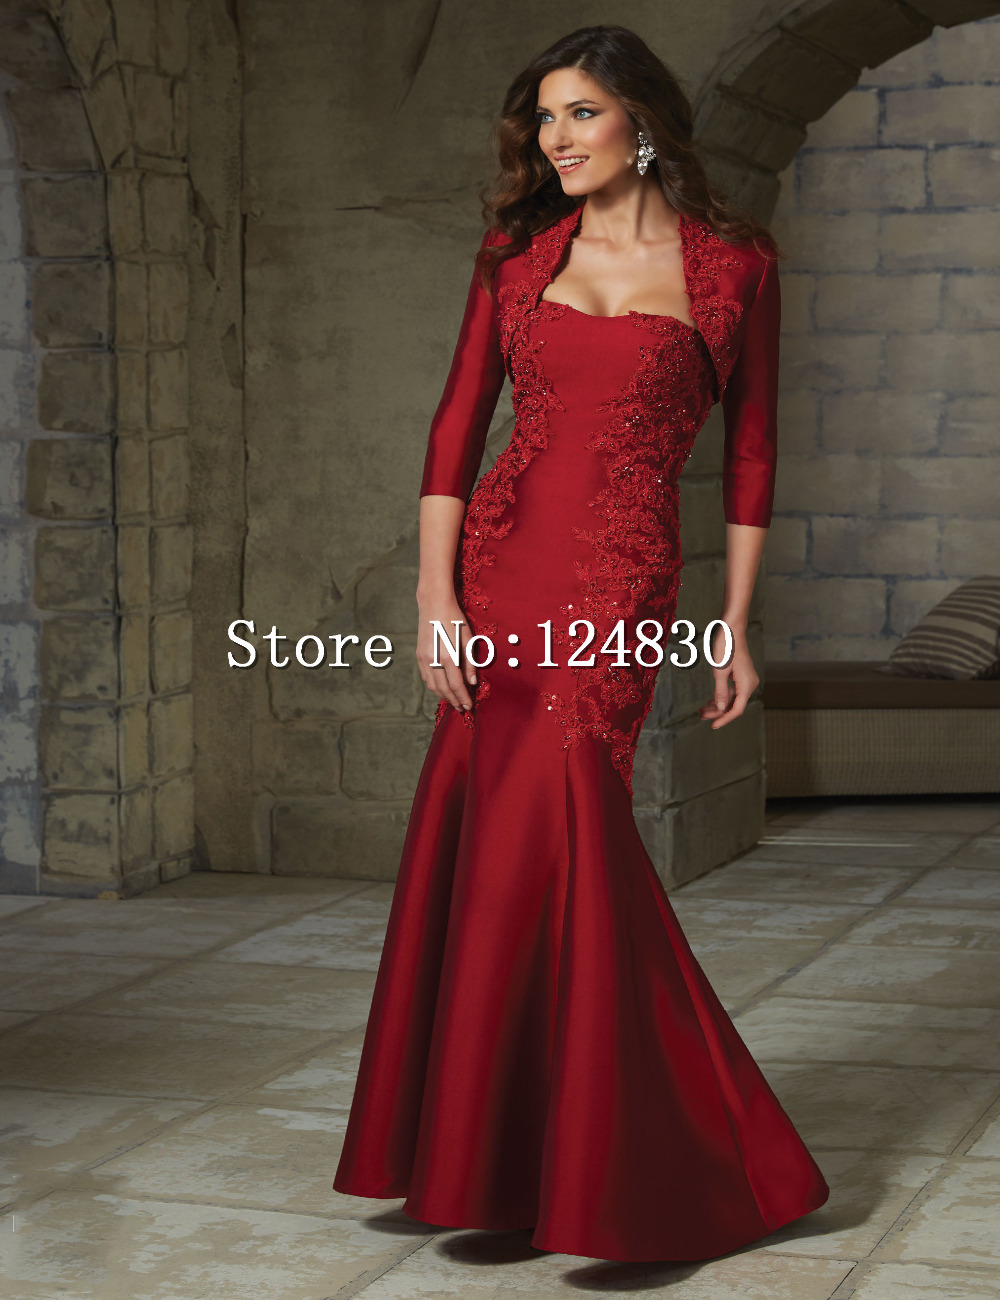 Aliexpress.com : Buy Free Shipping Hot Sell Long Bride Dress ...